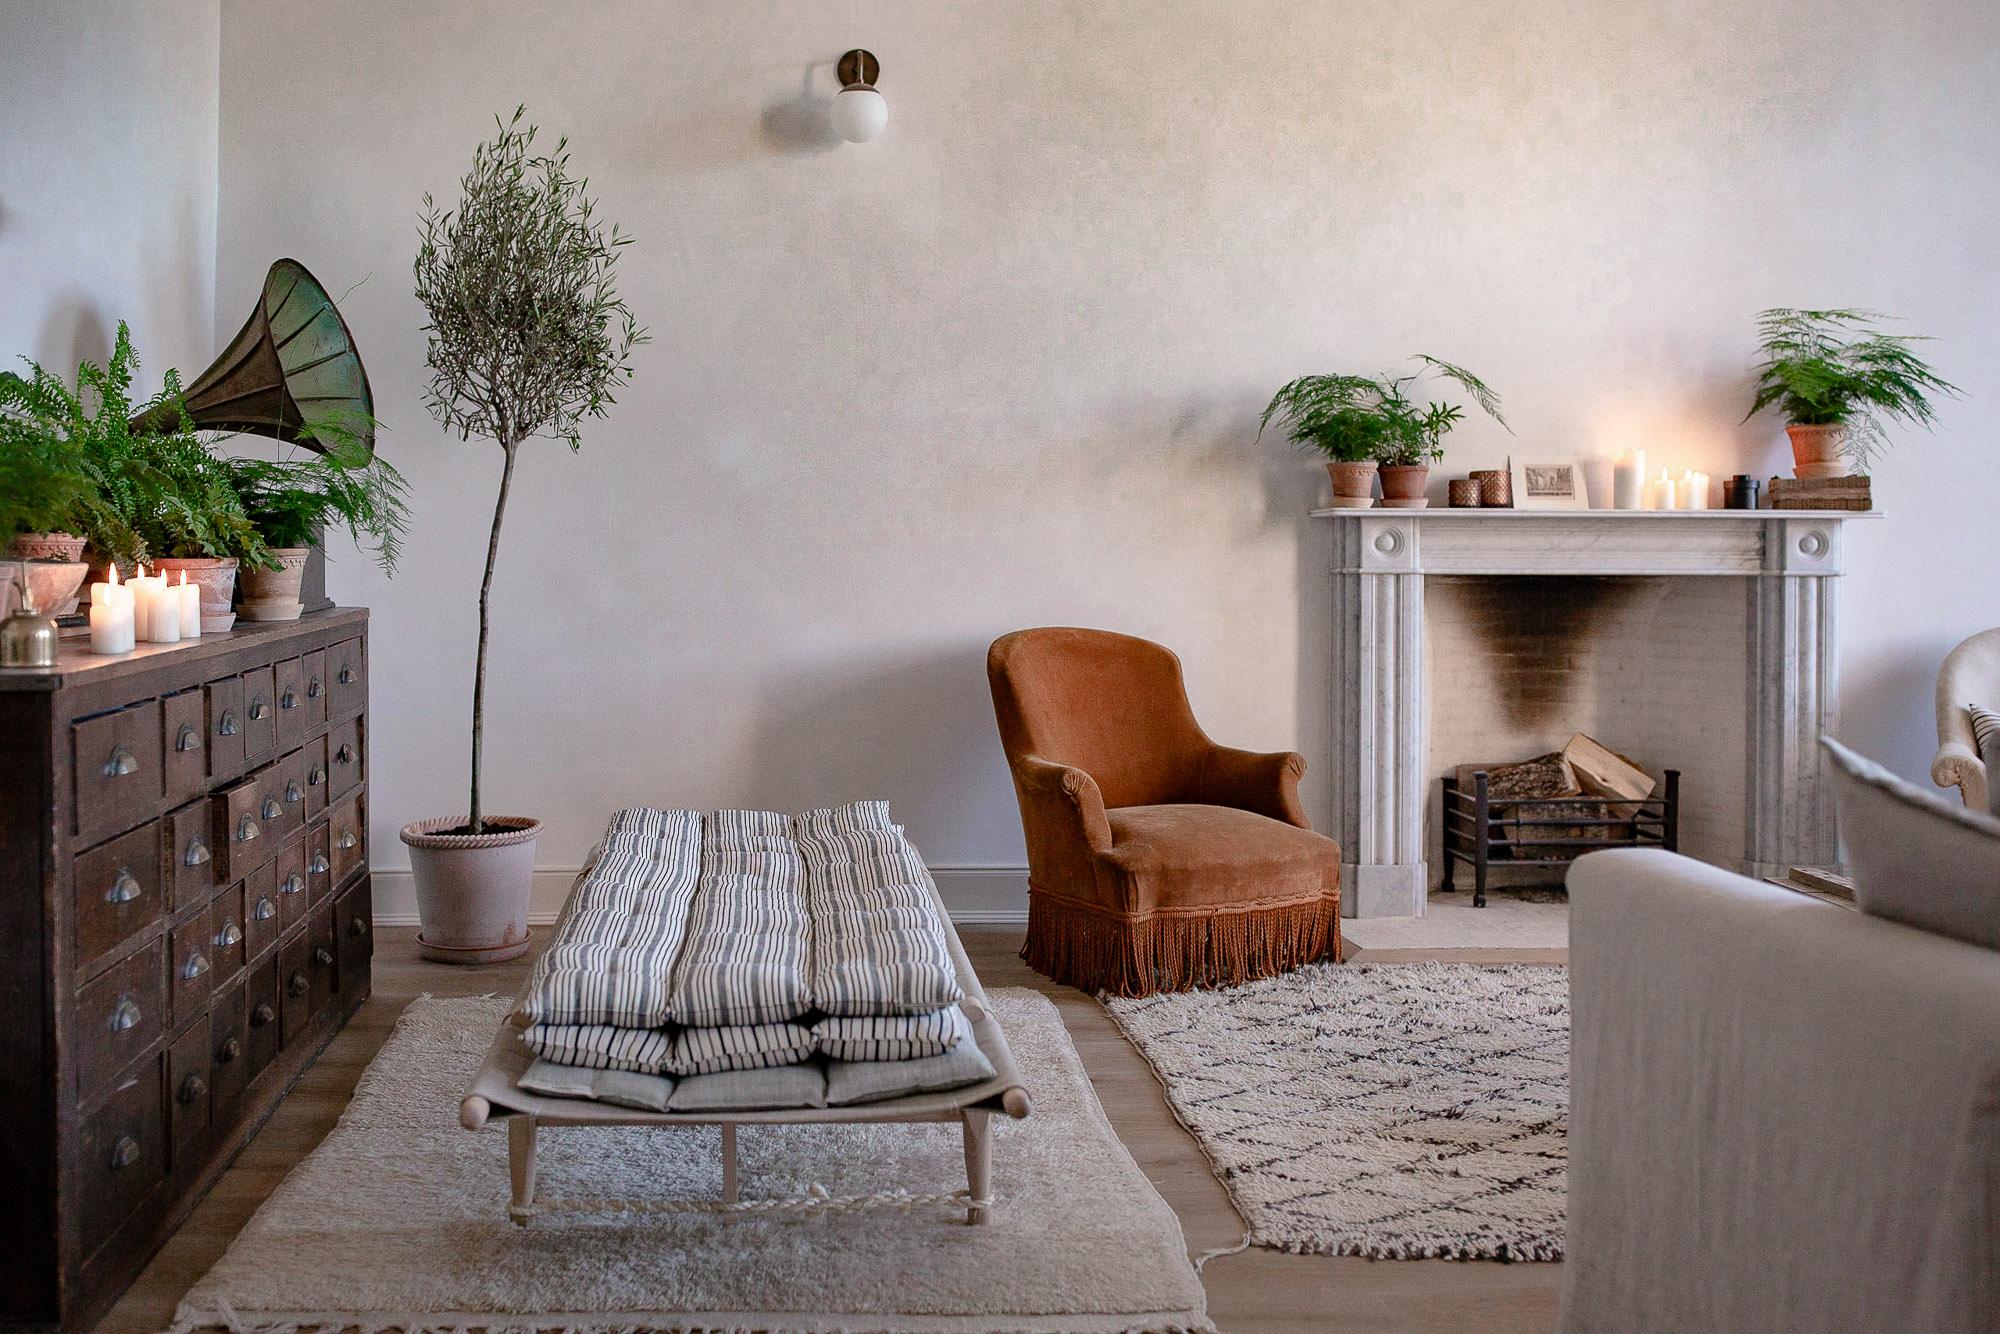 Home Design 3d Mod Apk ~ news word